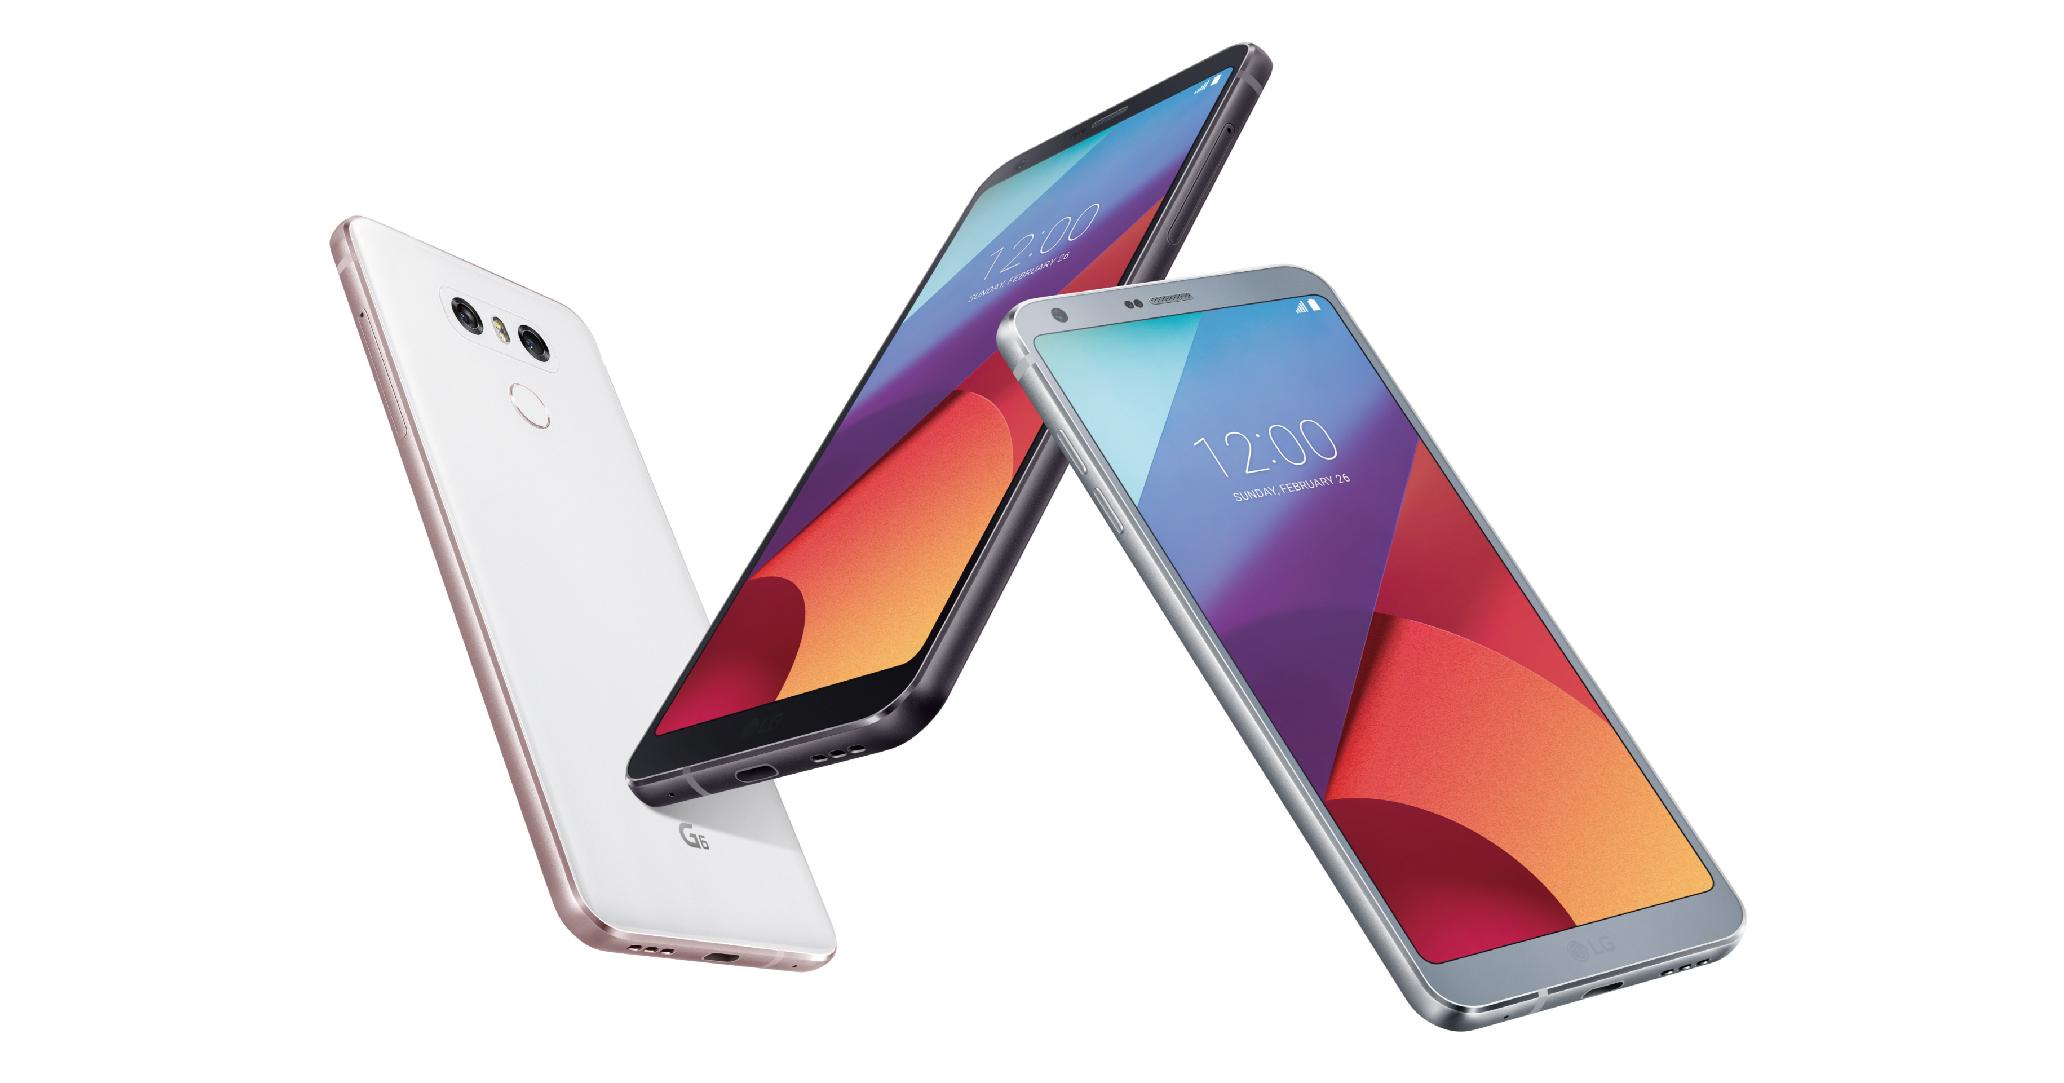 LG 發表年度新旗艦手機 G6,18:9 5.7 吋圓角螢幕、雙鏡頭廣角相機、IP68 防水防塵